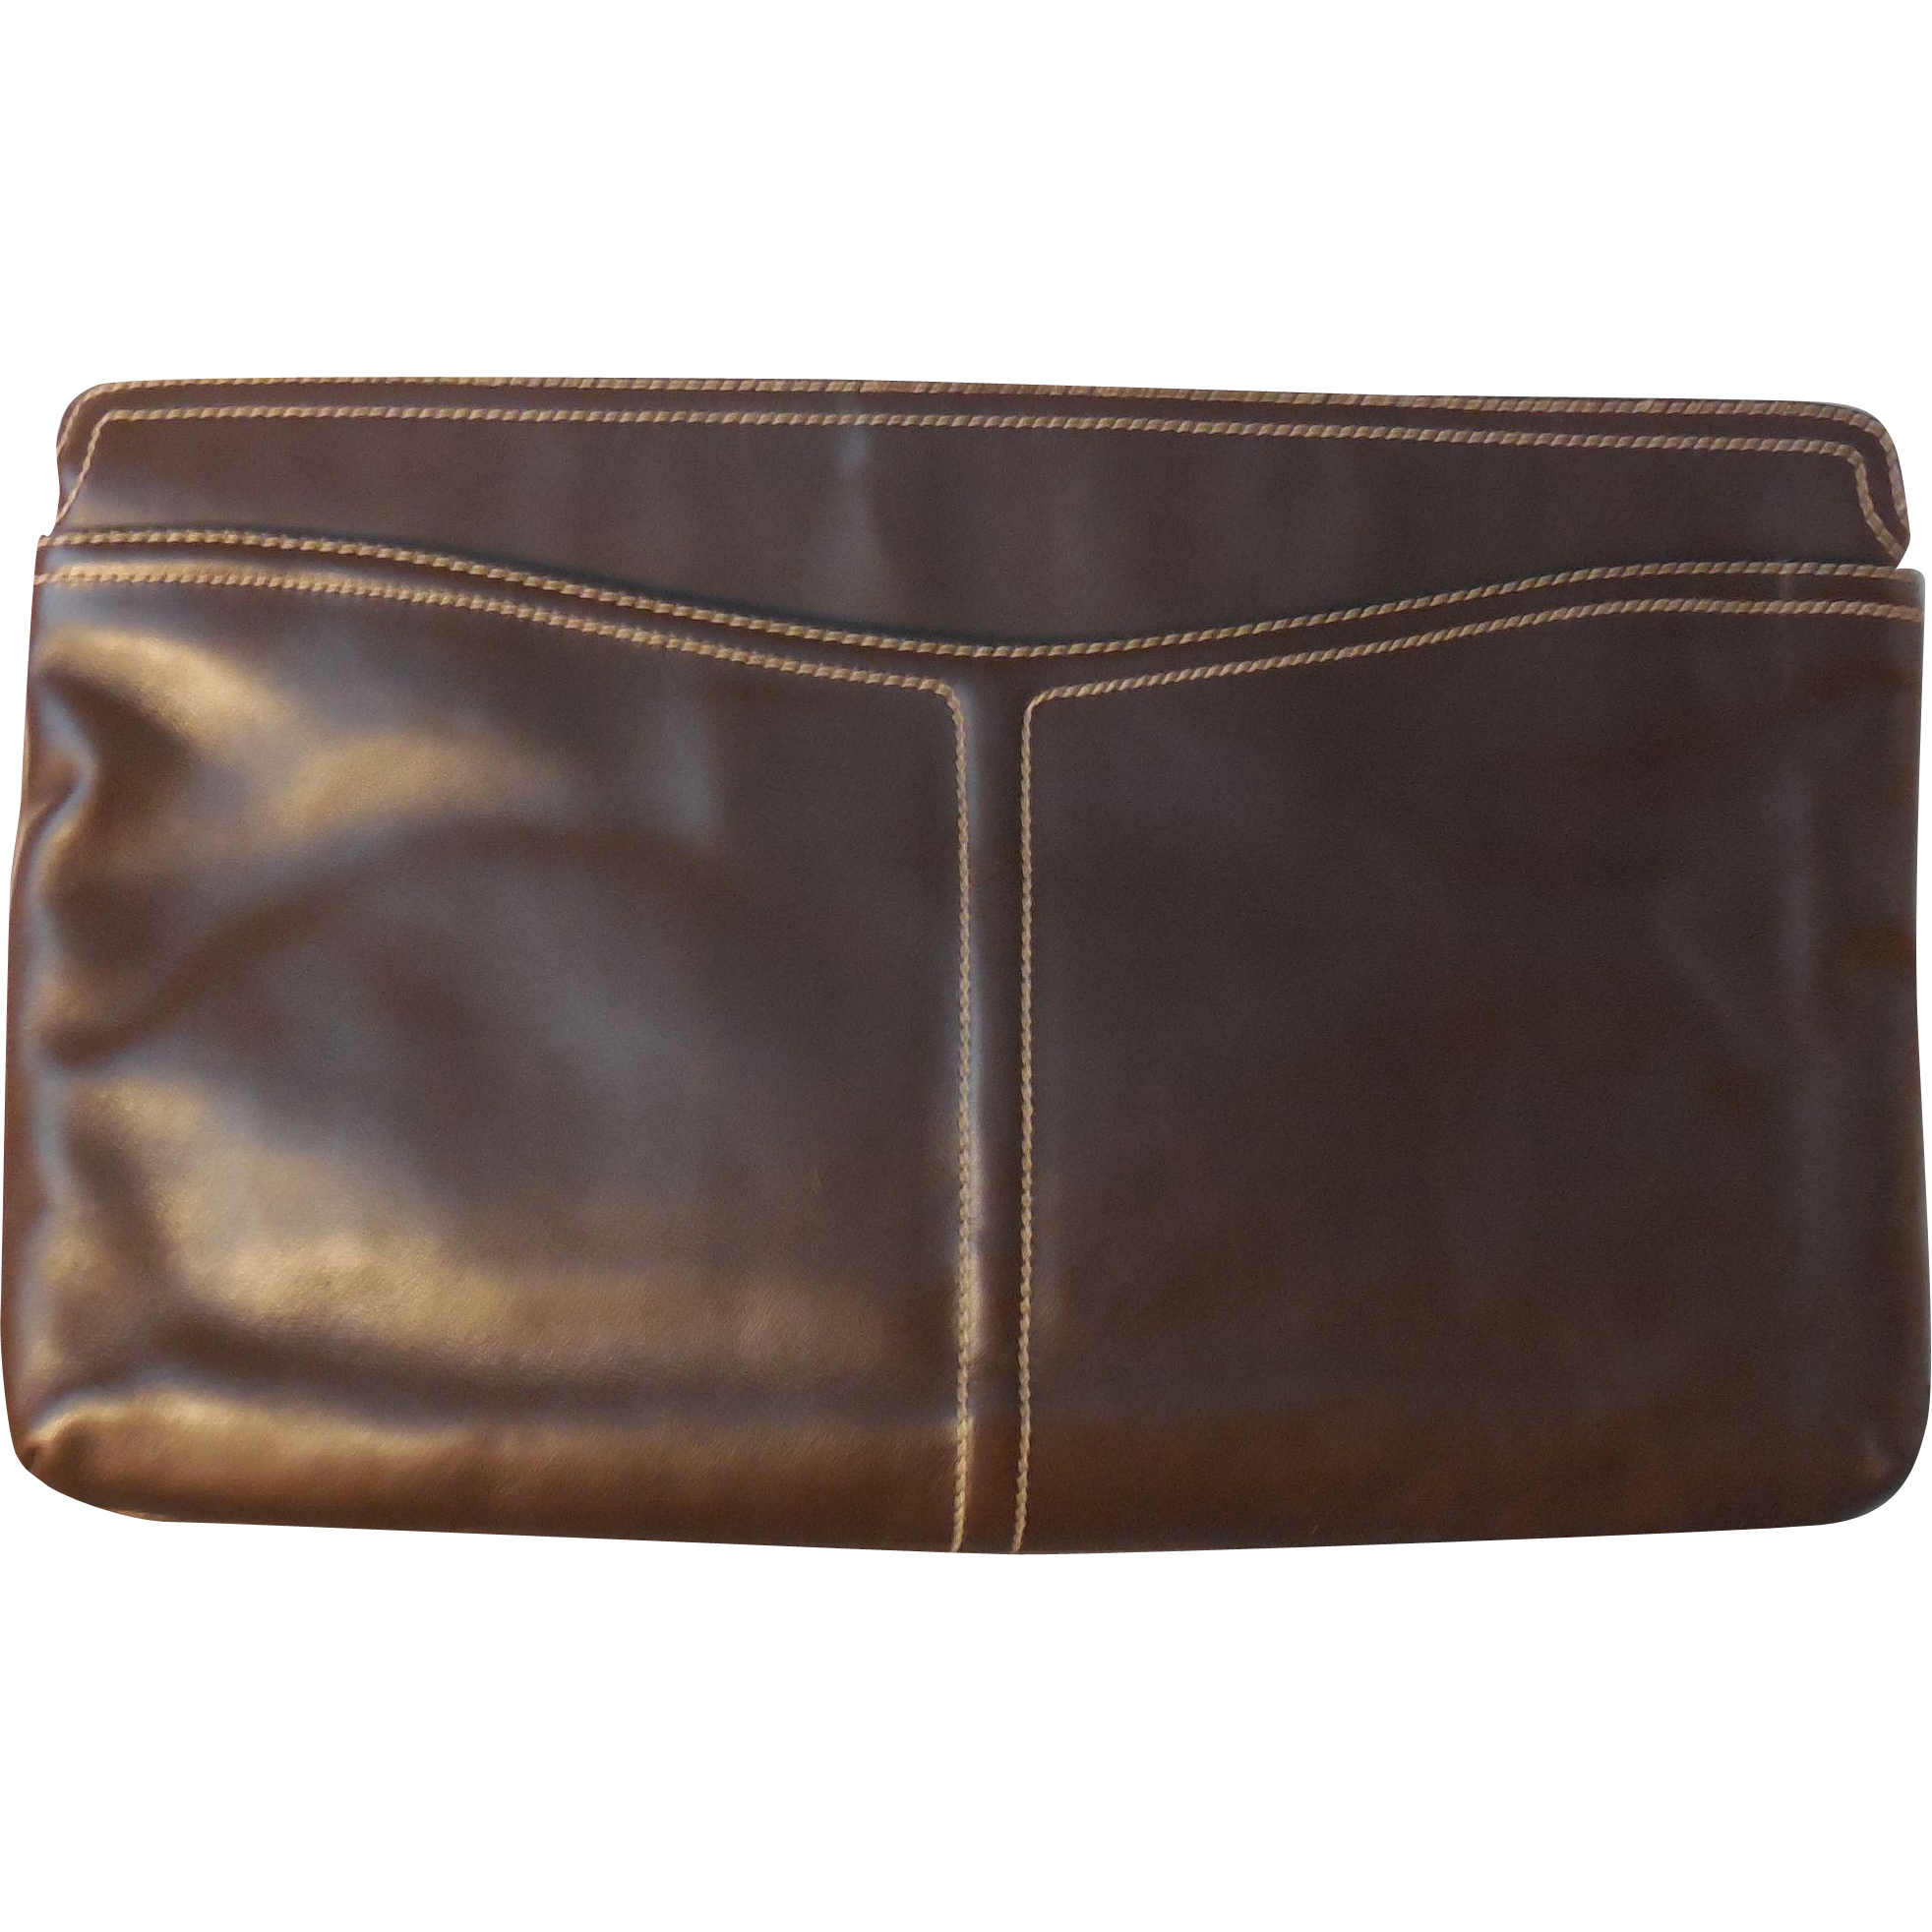 Large Vintage Morris Moskowitz Dark Brown Leather Handbag Purse Clutch